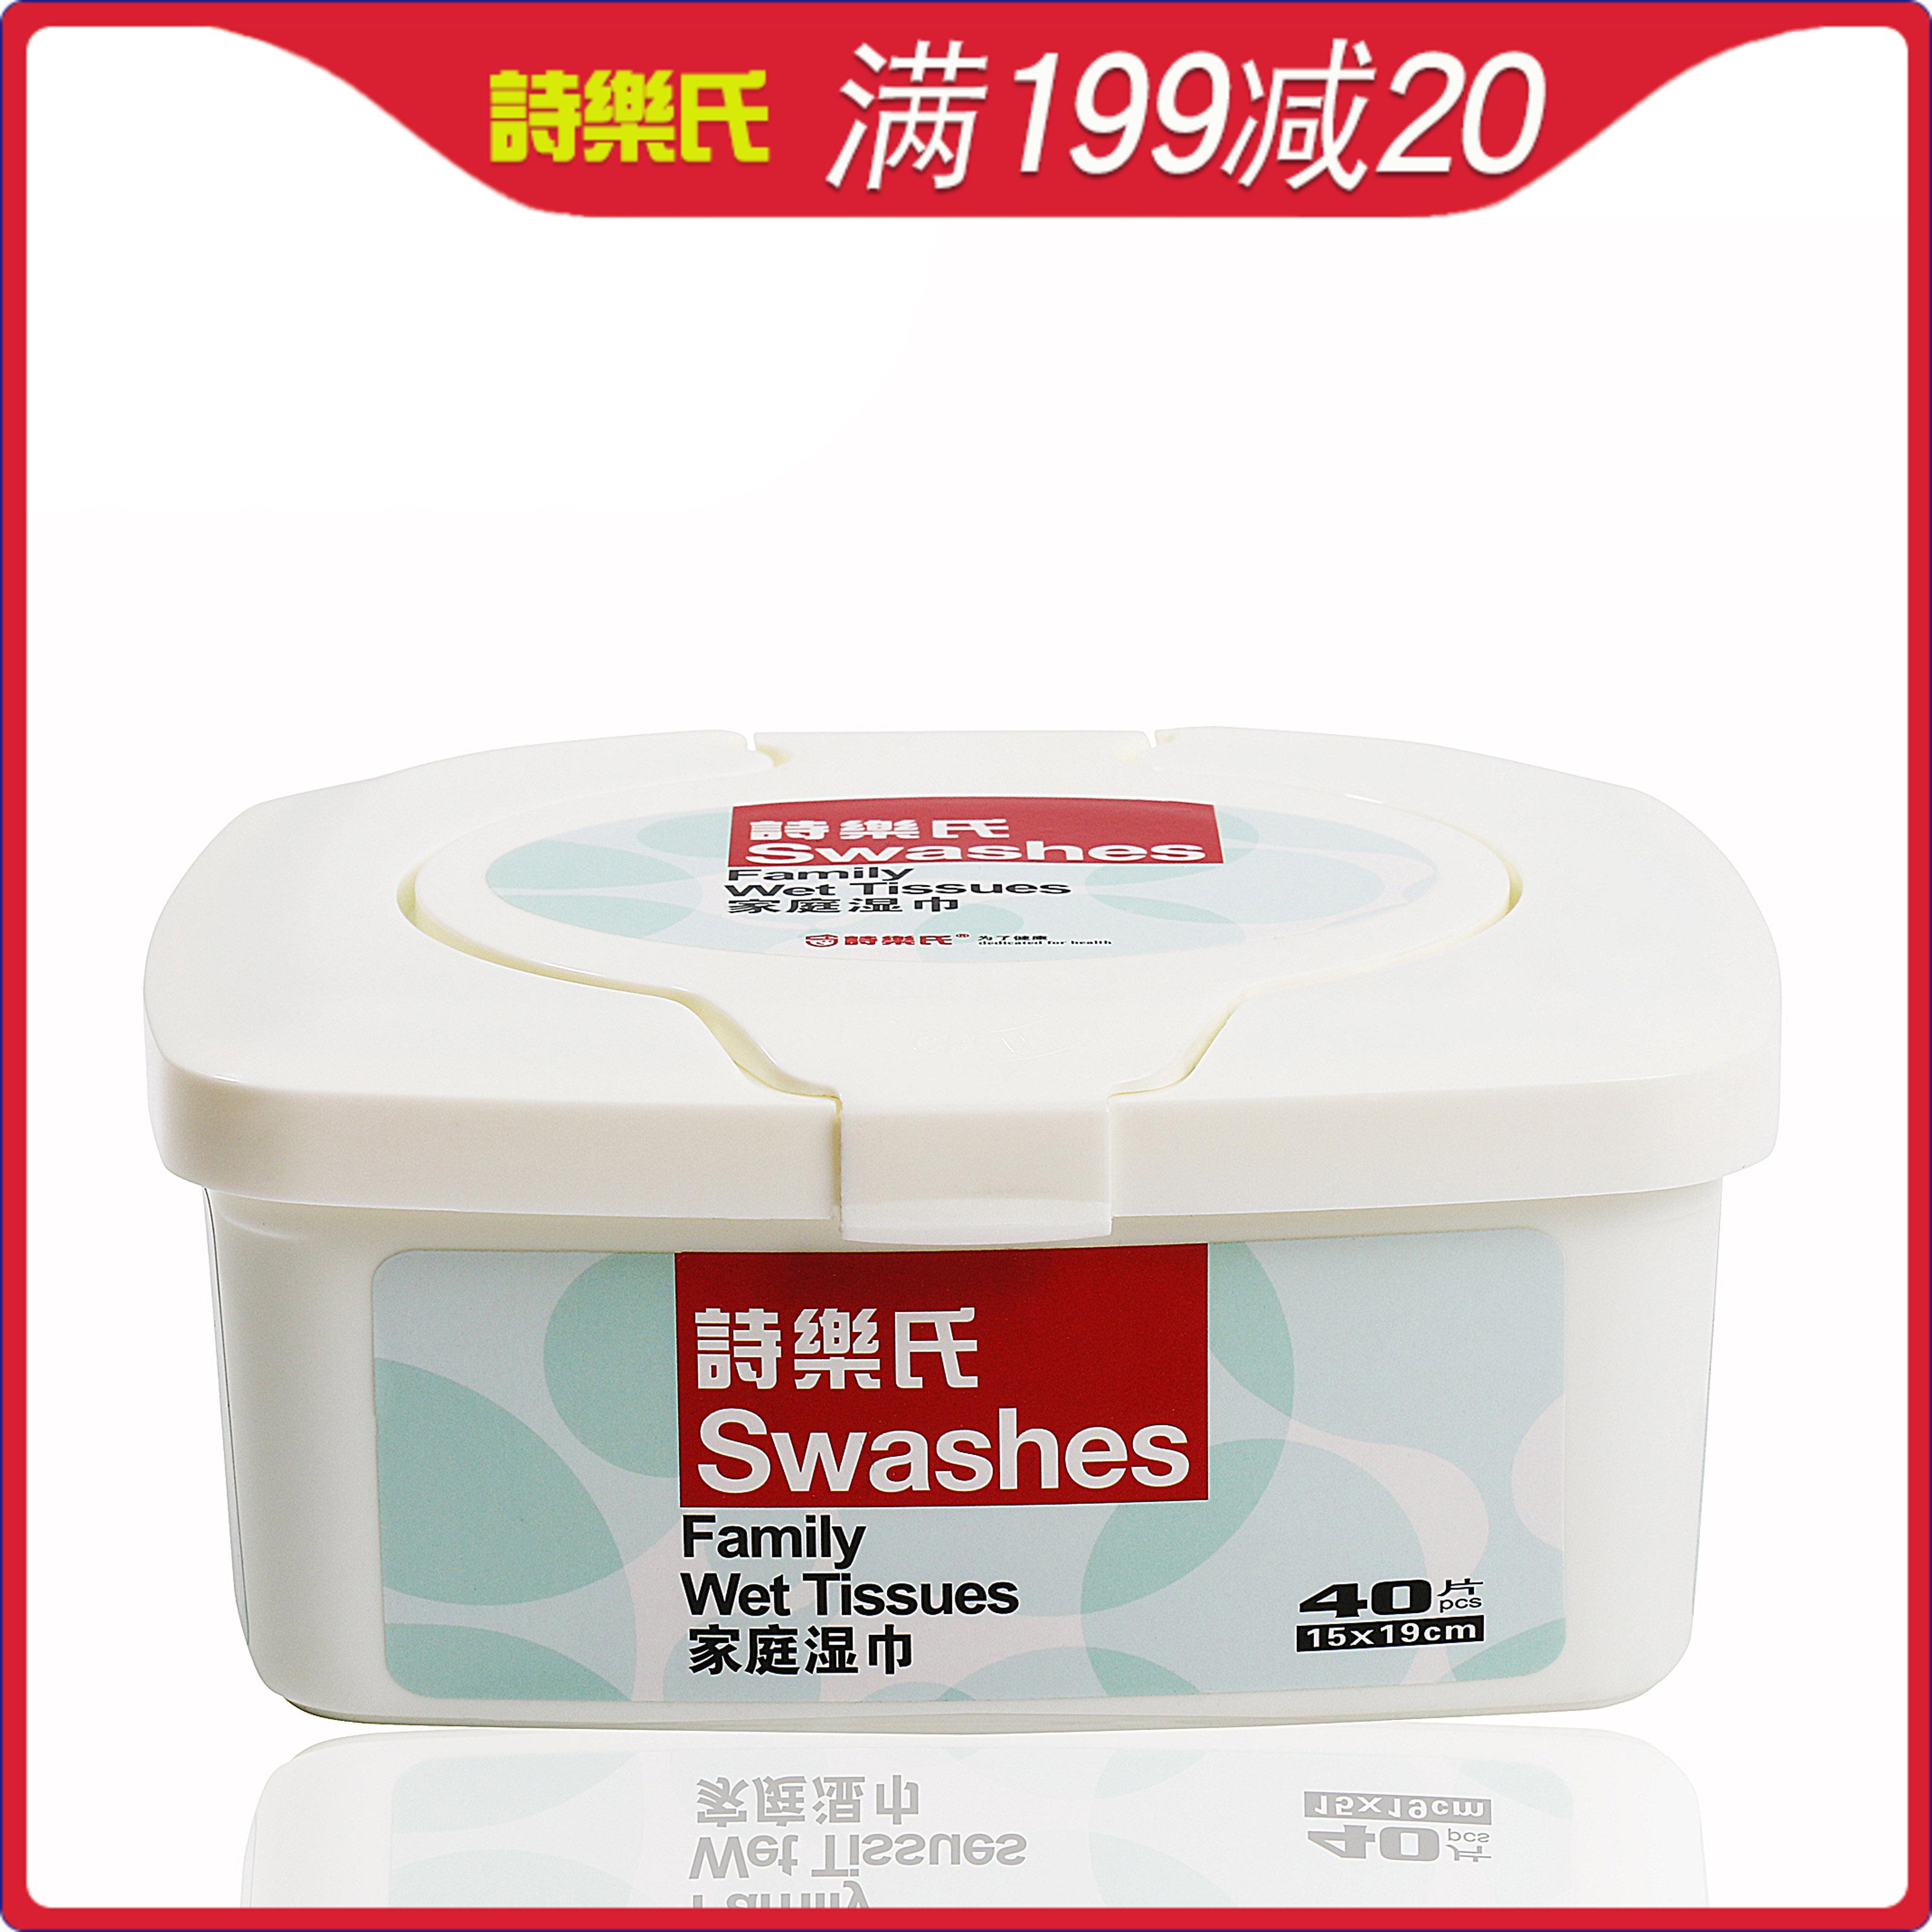 Swashes詩樂氏家庭衛生溼巾40片盒裝抽取出差旅行假期野餐裝清潔